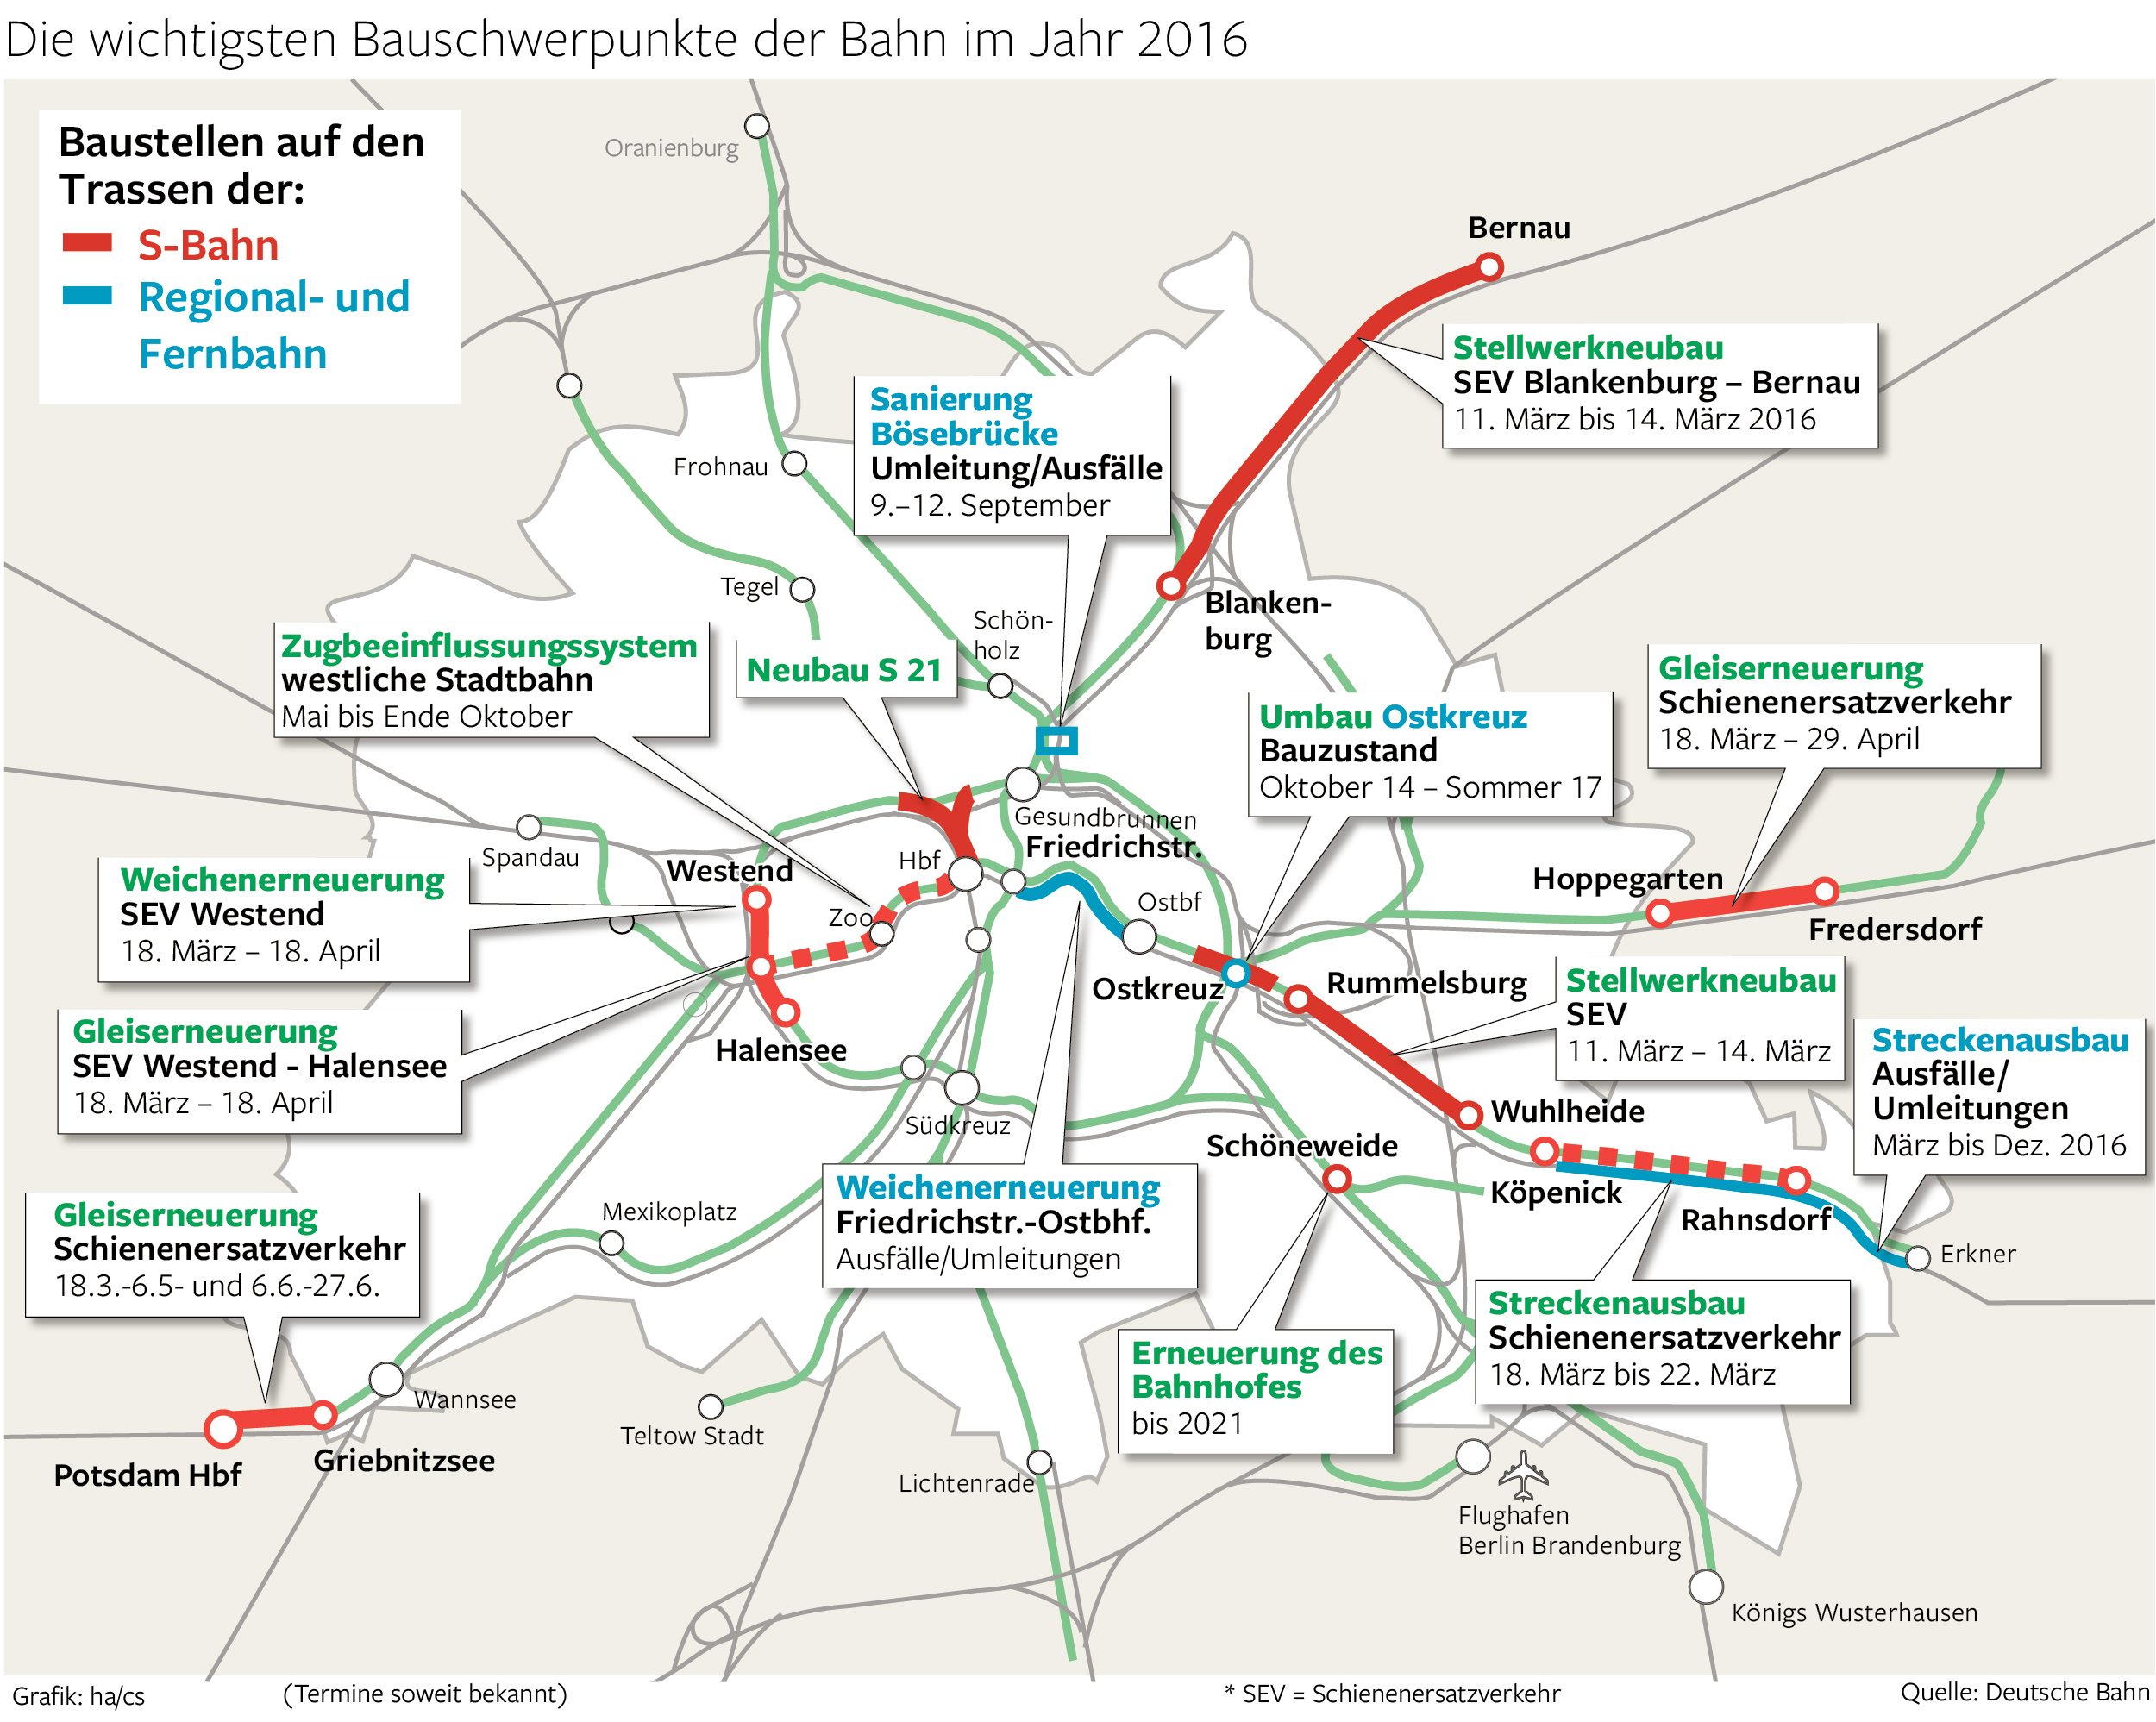 Bauschwerpunkte der Bahn 2016 in Berlin